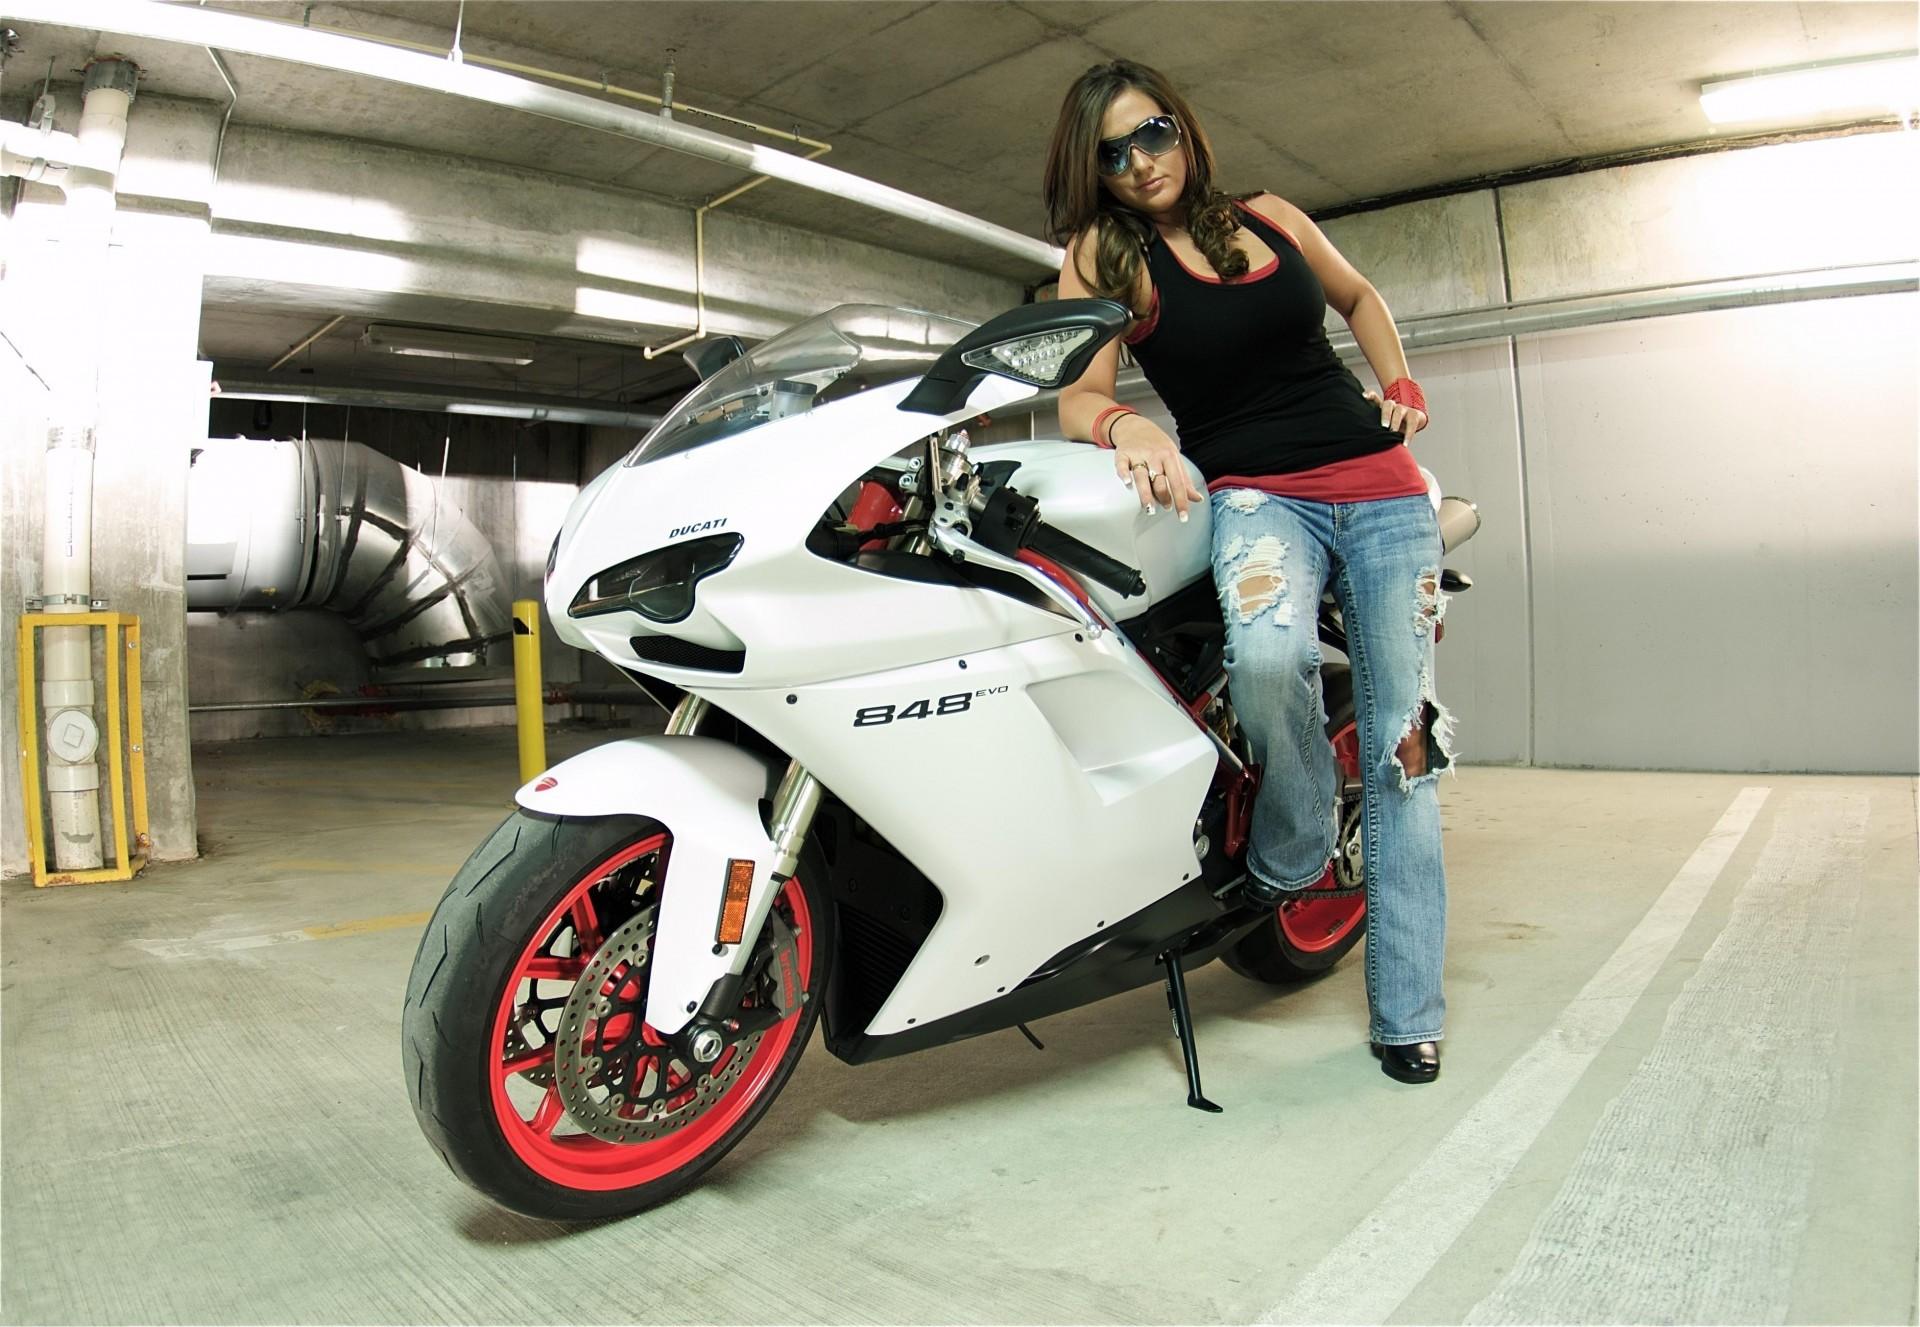 Фото на аву в вк для девушек на мотоцикле